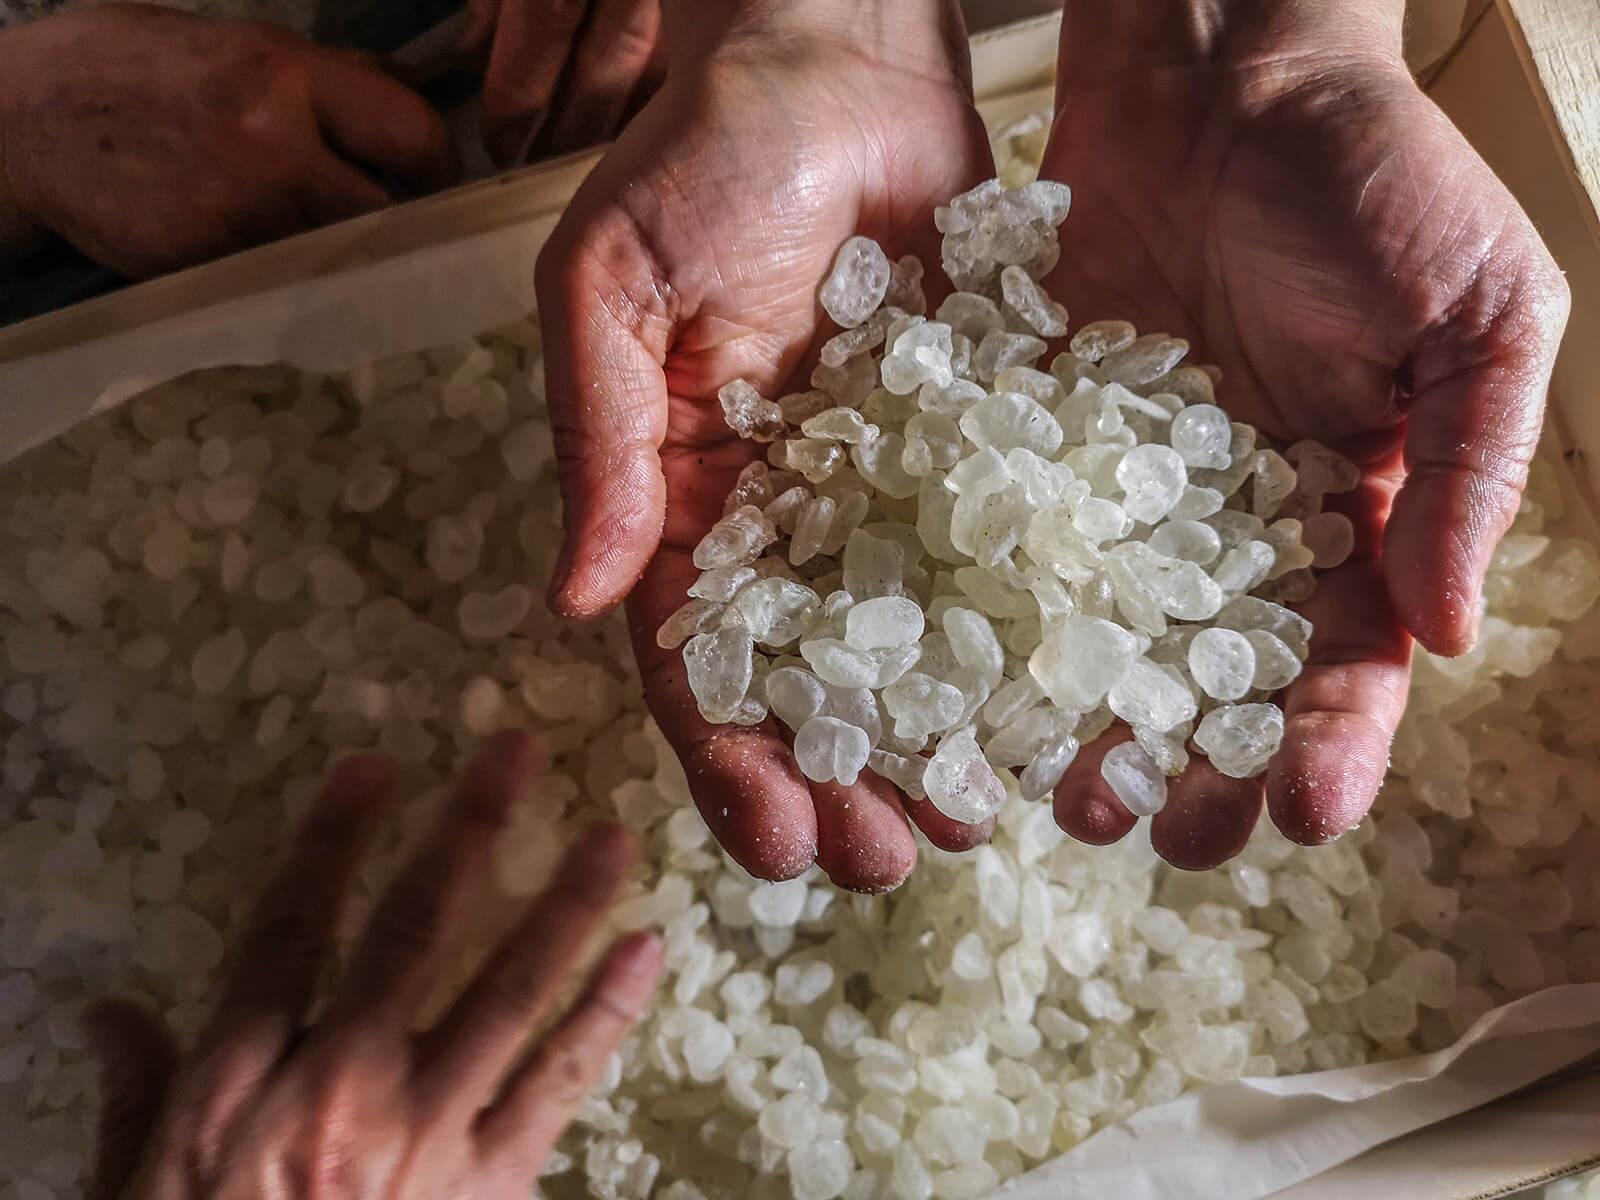 Chios Mastiha Cultivation - Cleaning Chios Mastiha Tears